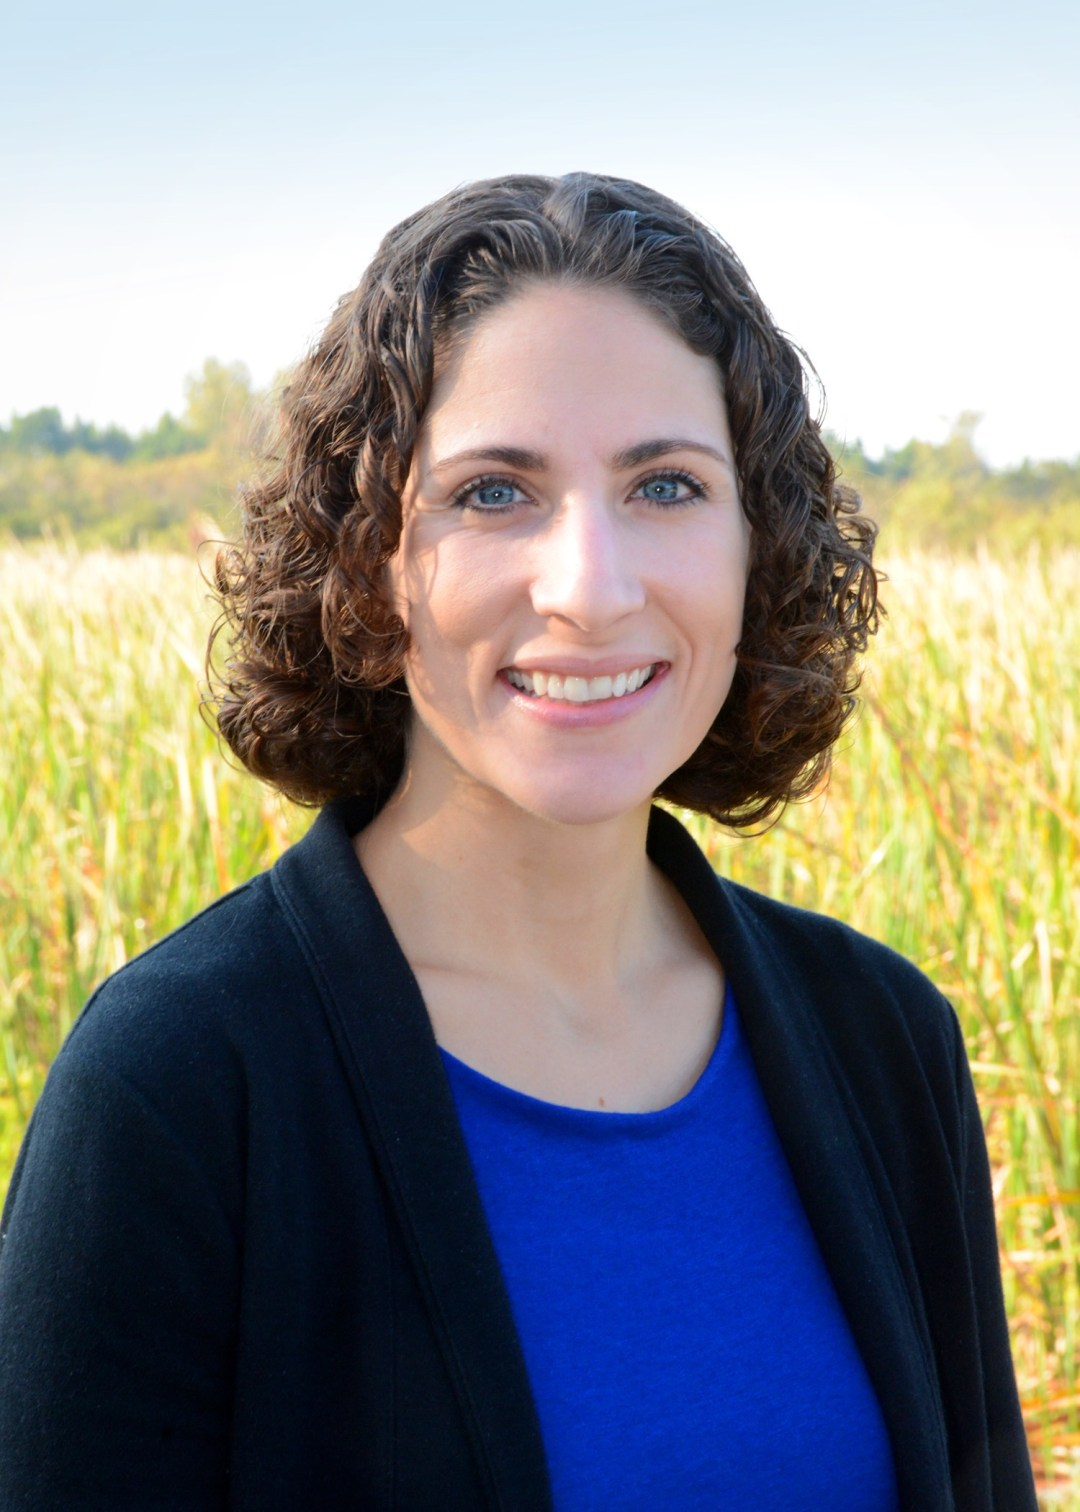 Adrienne Centinaro LCSW CPC Therapist Counselor